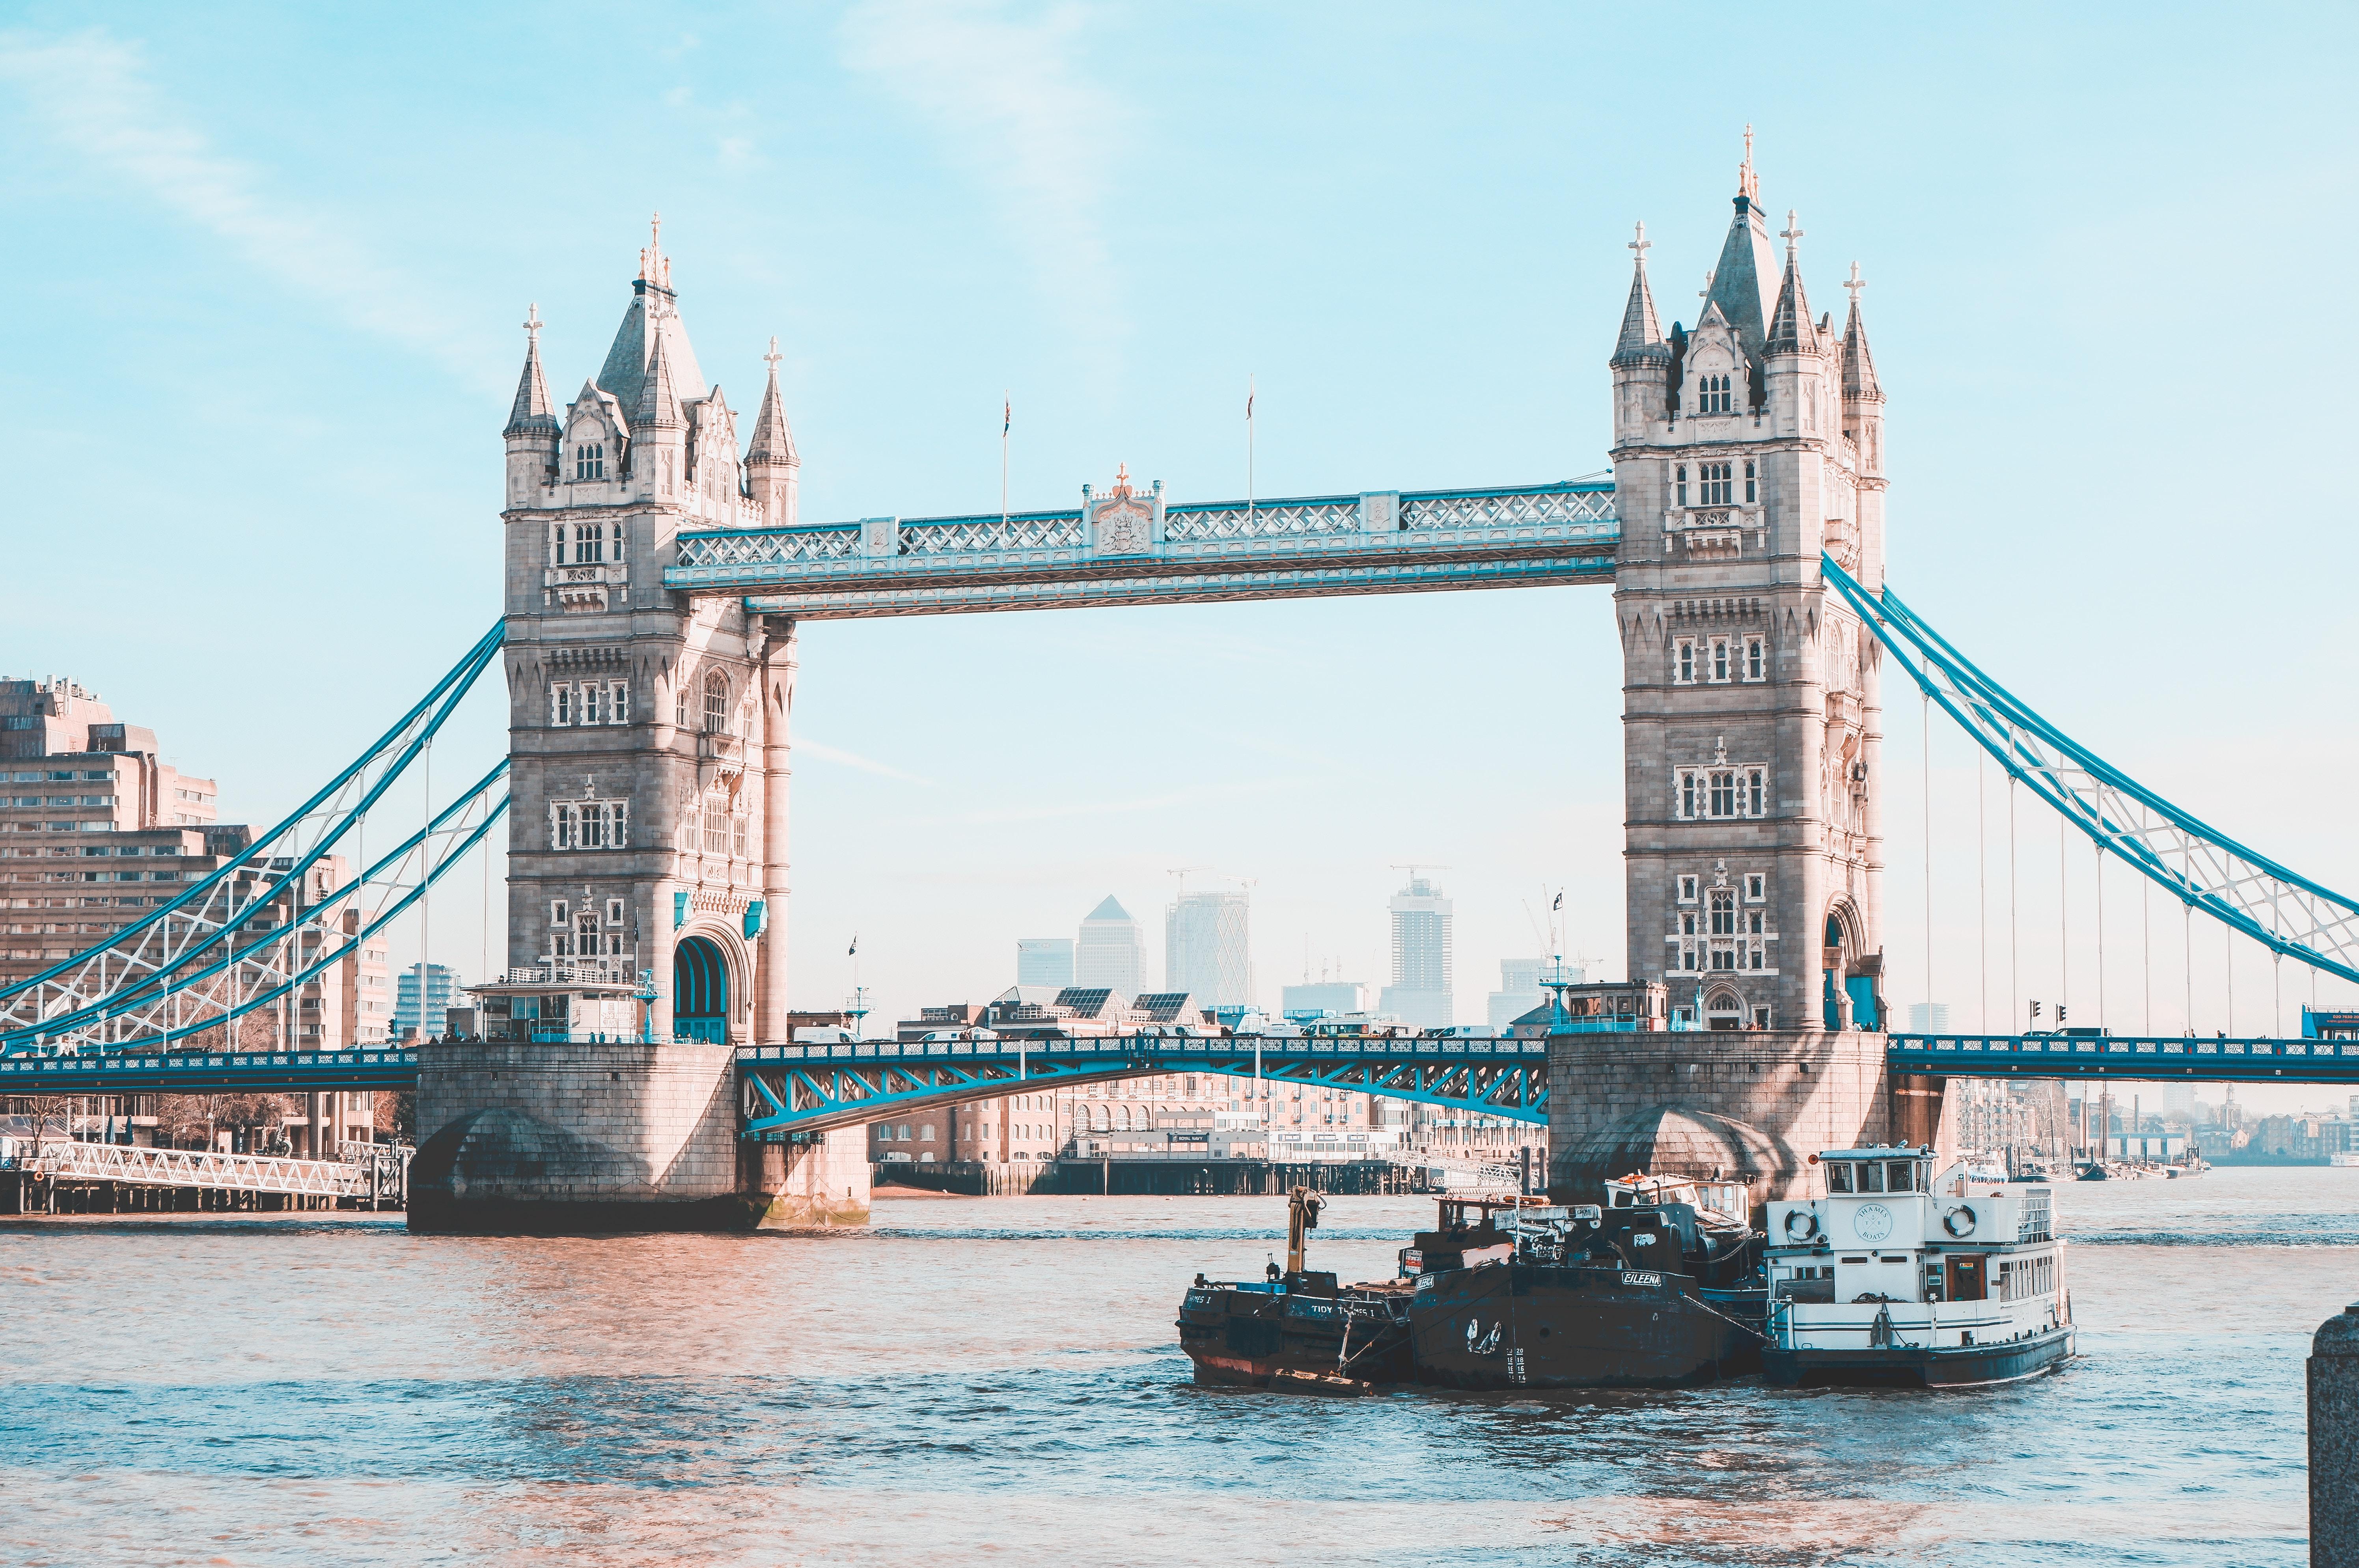 Tower Bridge, England